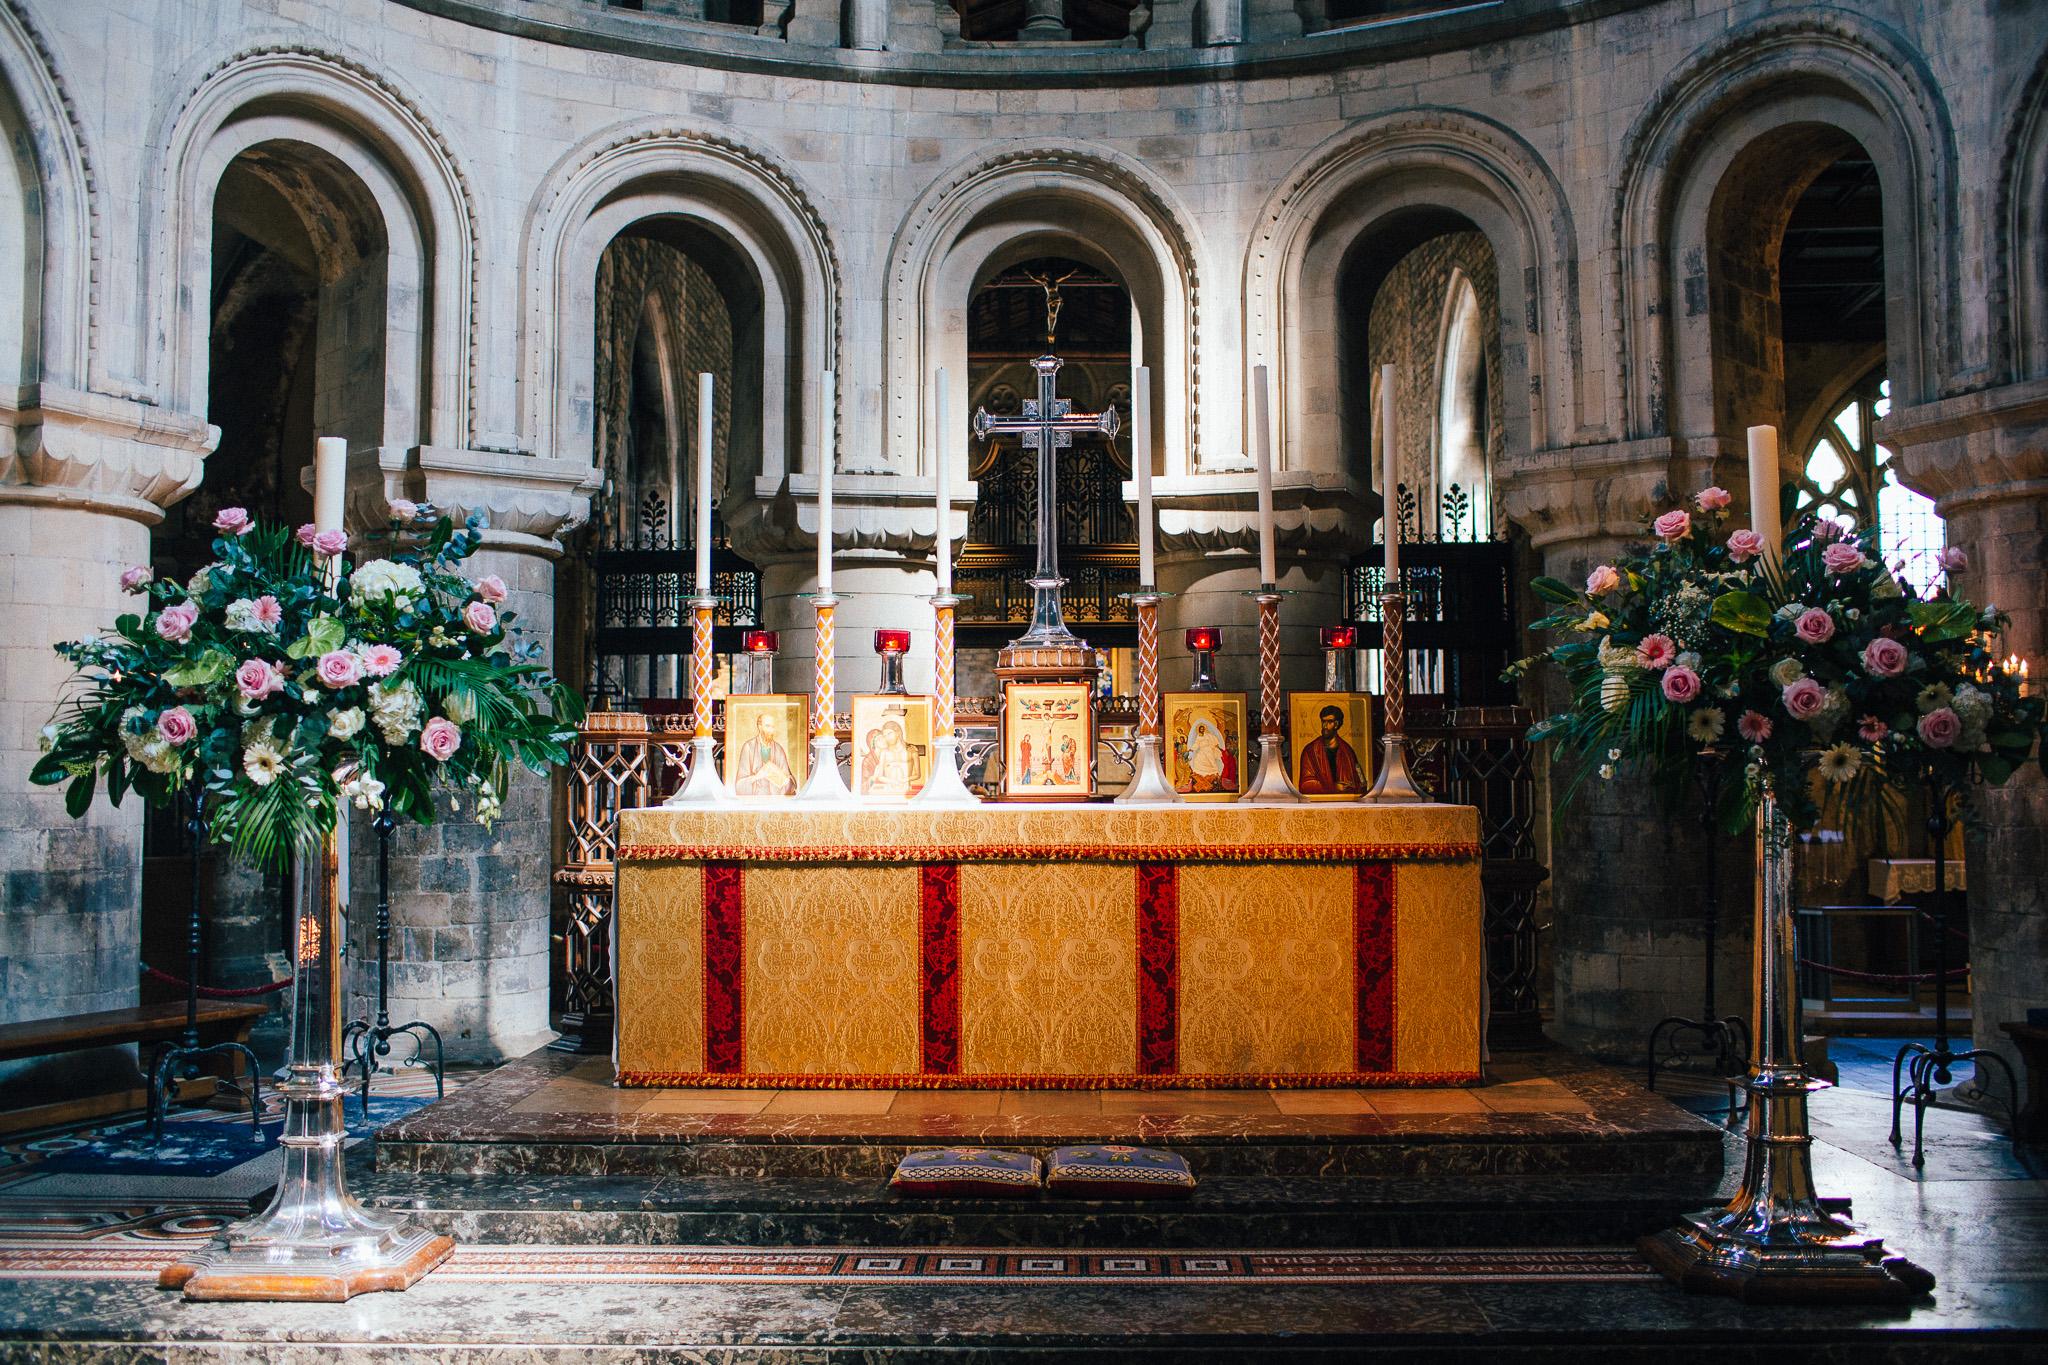 st barts church london wedding